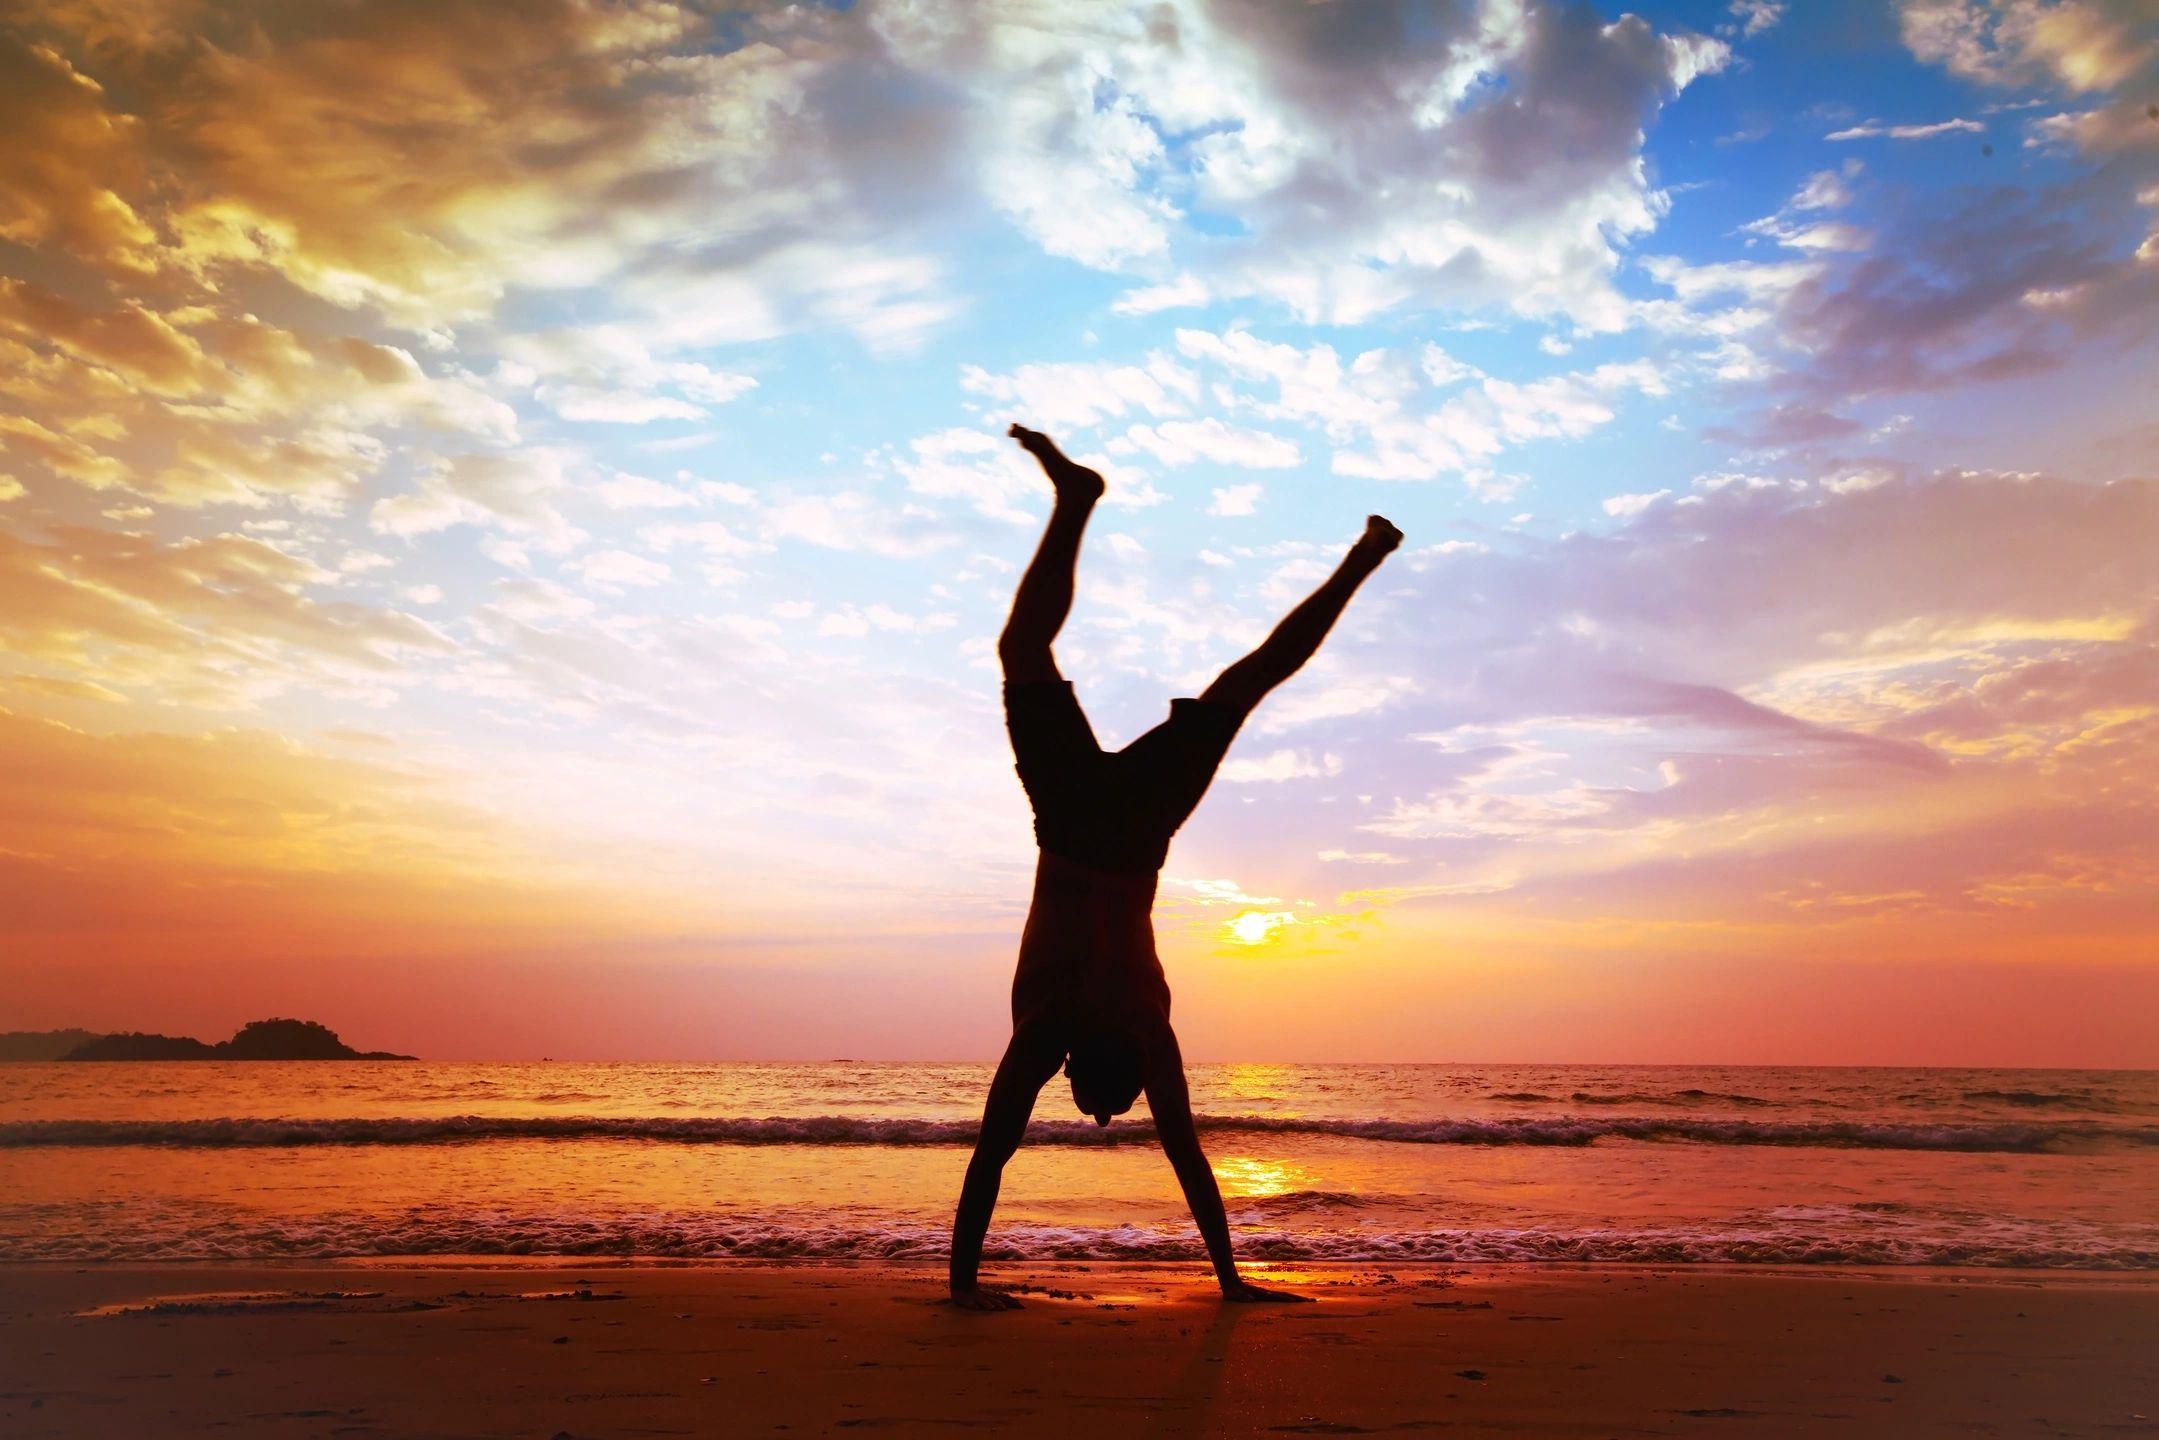 Overcoming anxiety, cartwheel on the beach